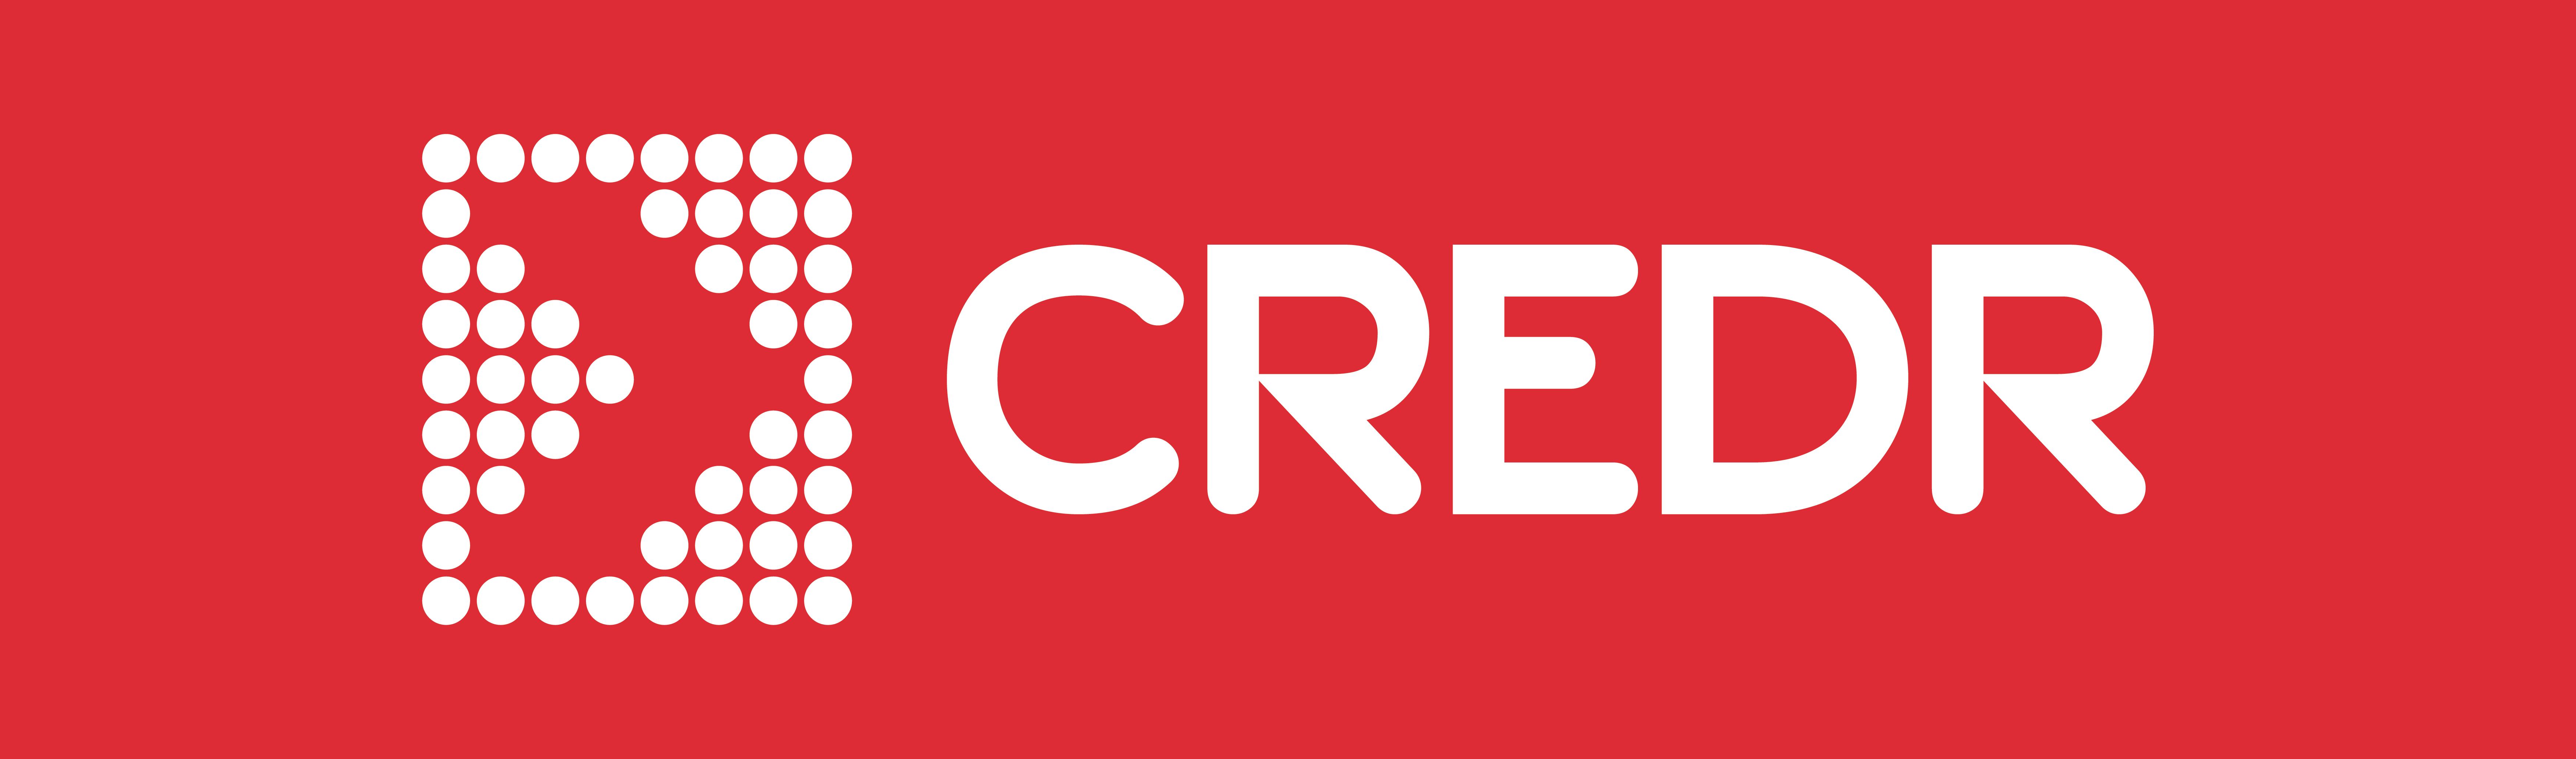 Credr Logo-02